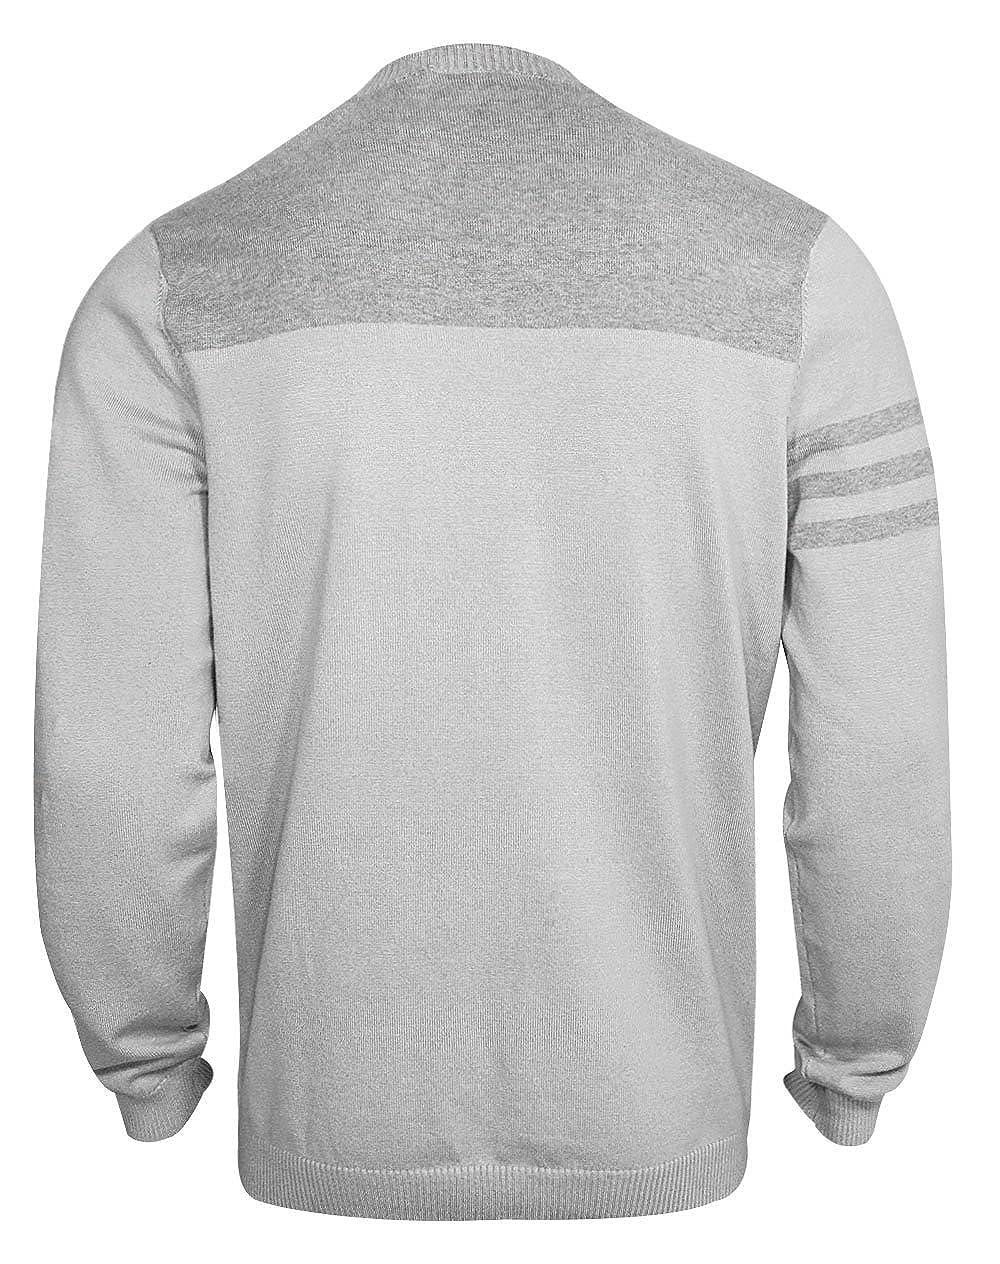 b717d3d35 Amazon.com: adidas Golf Men's Adi 3 Stripe Crewneck Sweater: Clothing